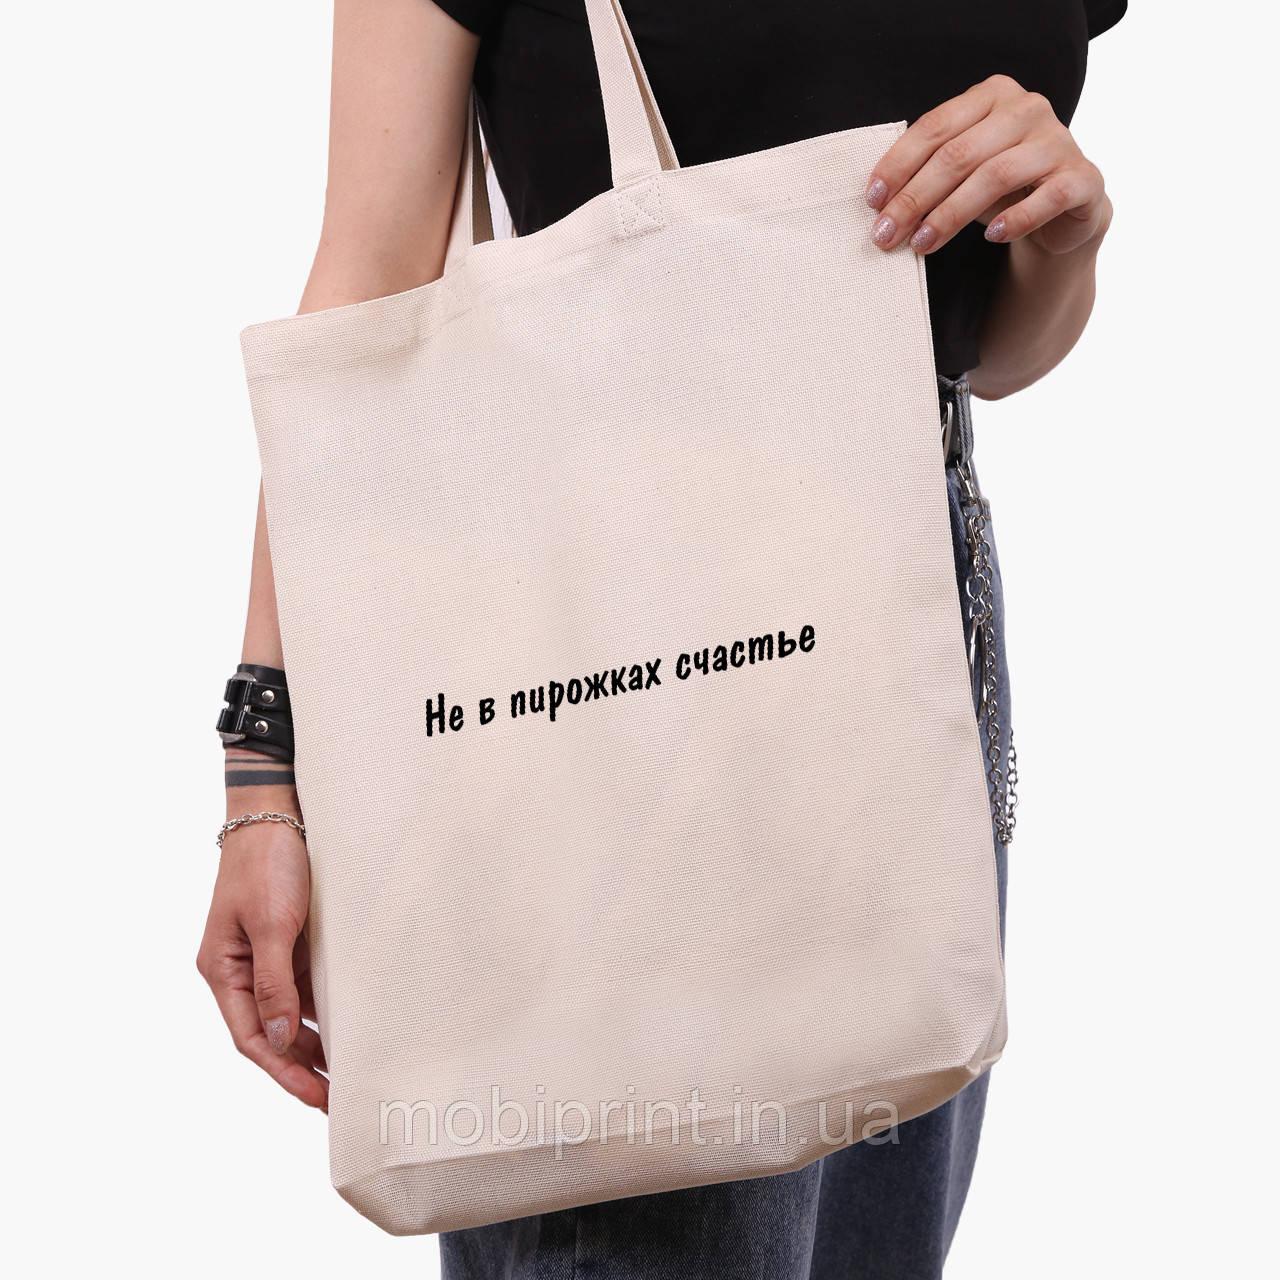 Еко-сумка з принтом (23-57) Чорний